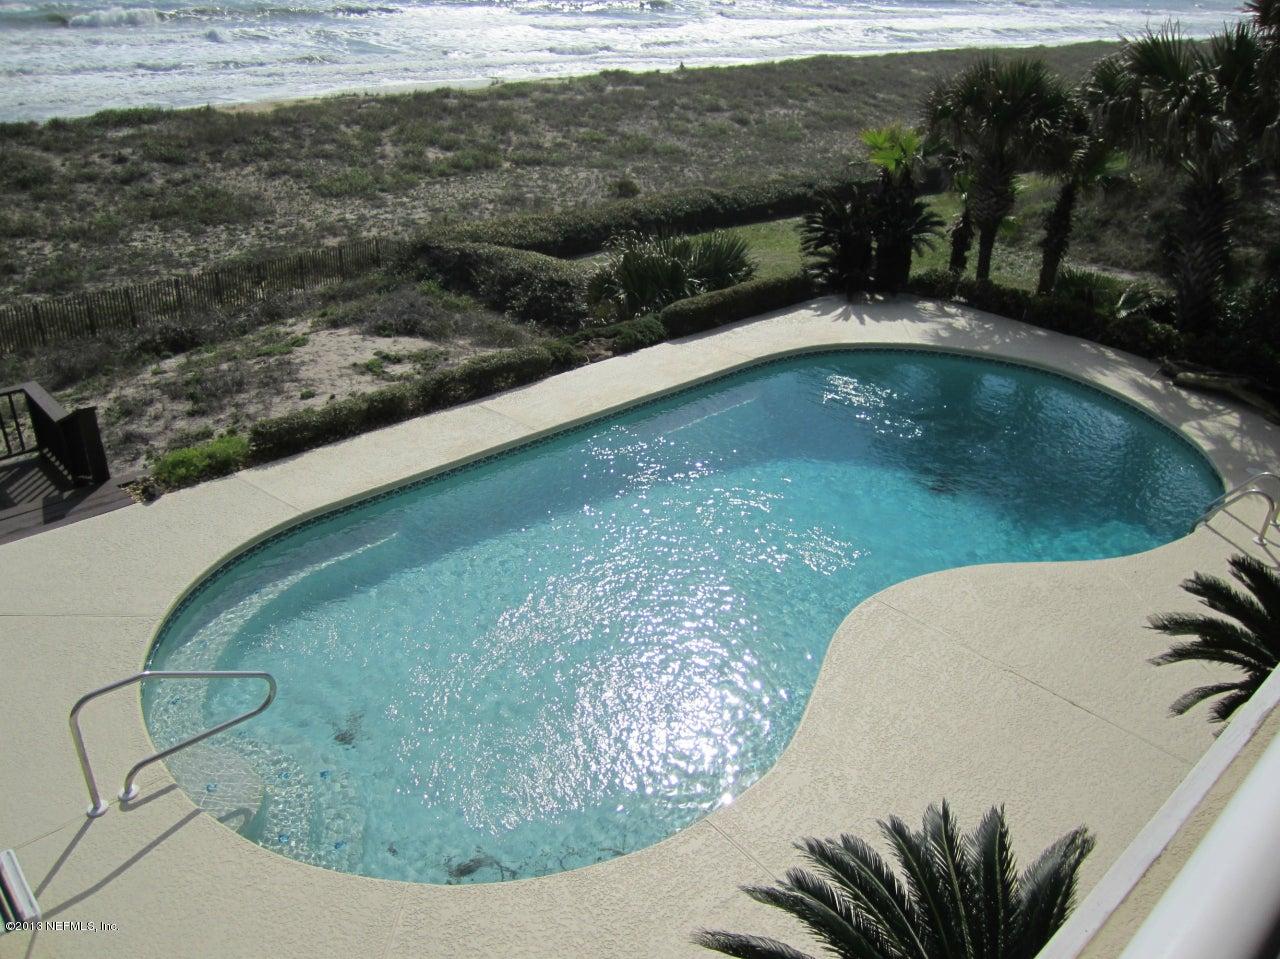 1299 PONTE VEDRA,PONTE VEDRA BEACH,FLORIDA 32082-4402,5 Bedrooms Bedrooms,5 BathroomsBathrooms,Residential - single family,PONTE VEDRA,661464